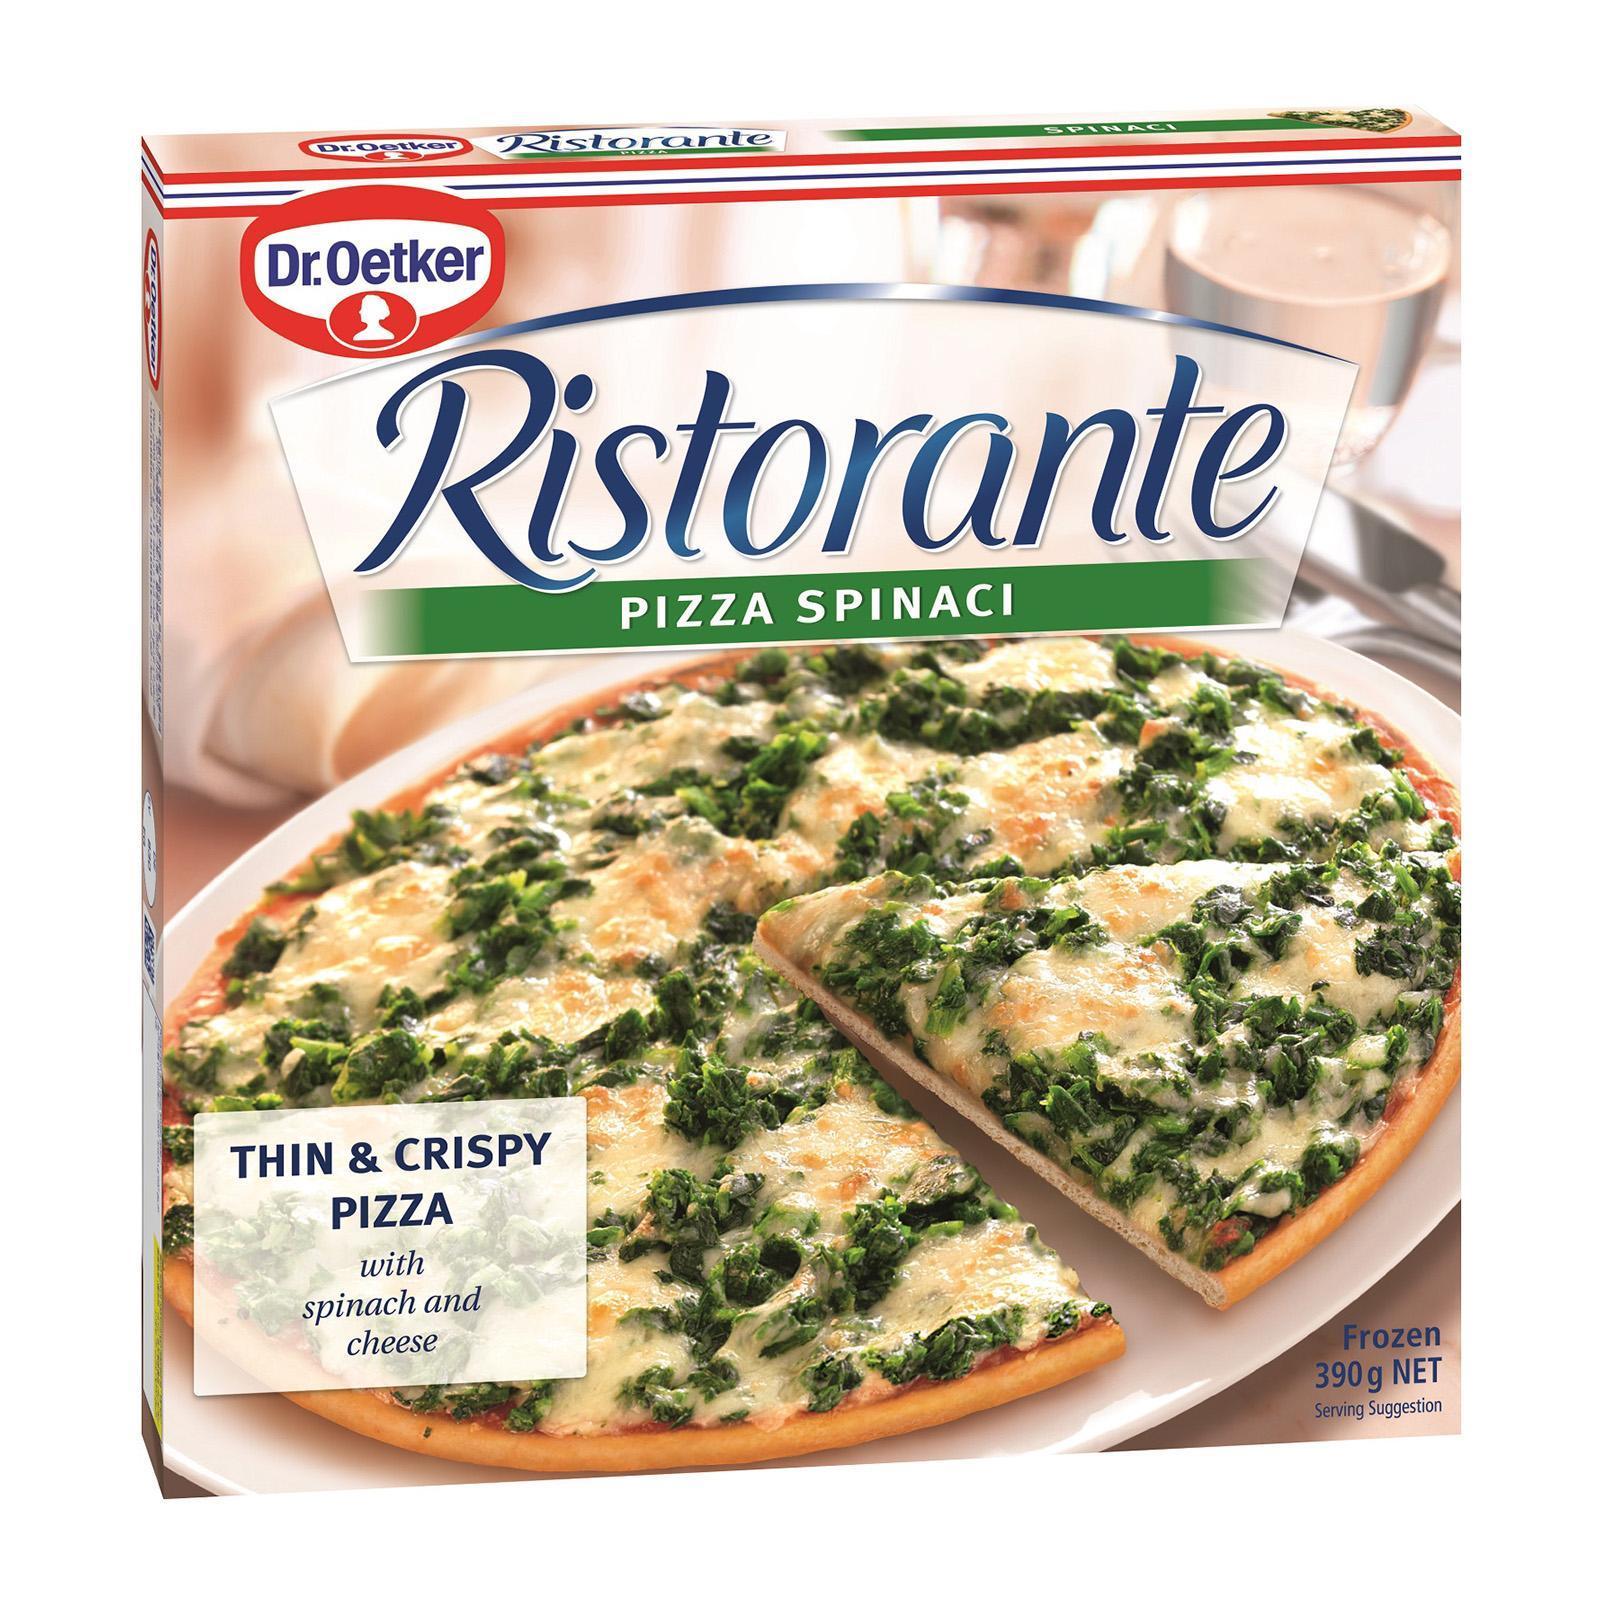 Dr Oetker Ristorante - Spinach - Frozen By Redmart.